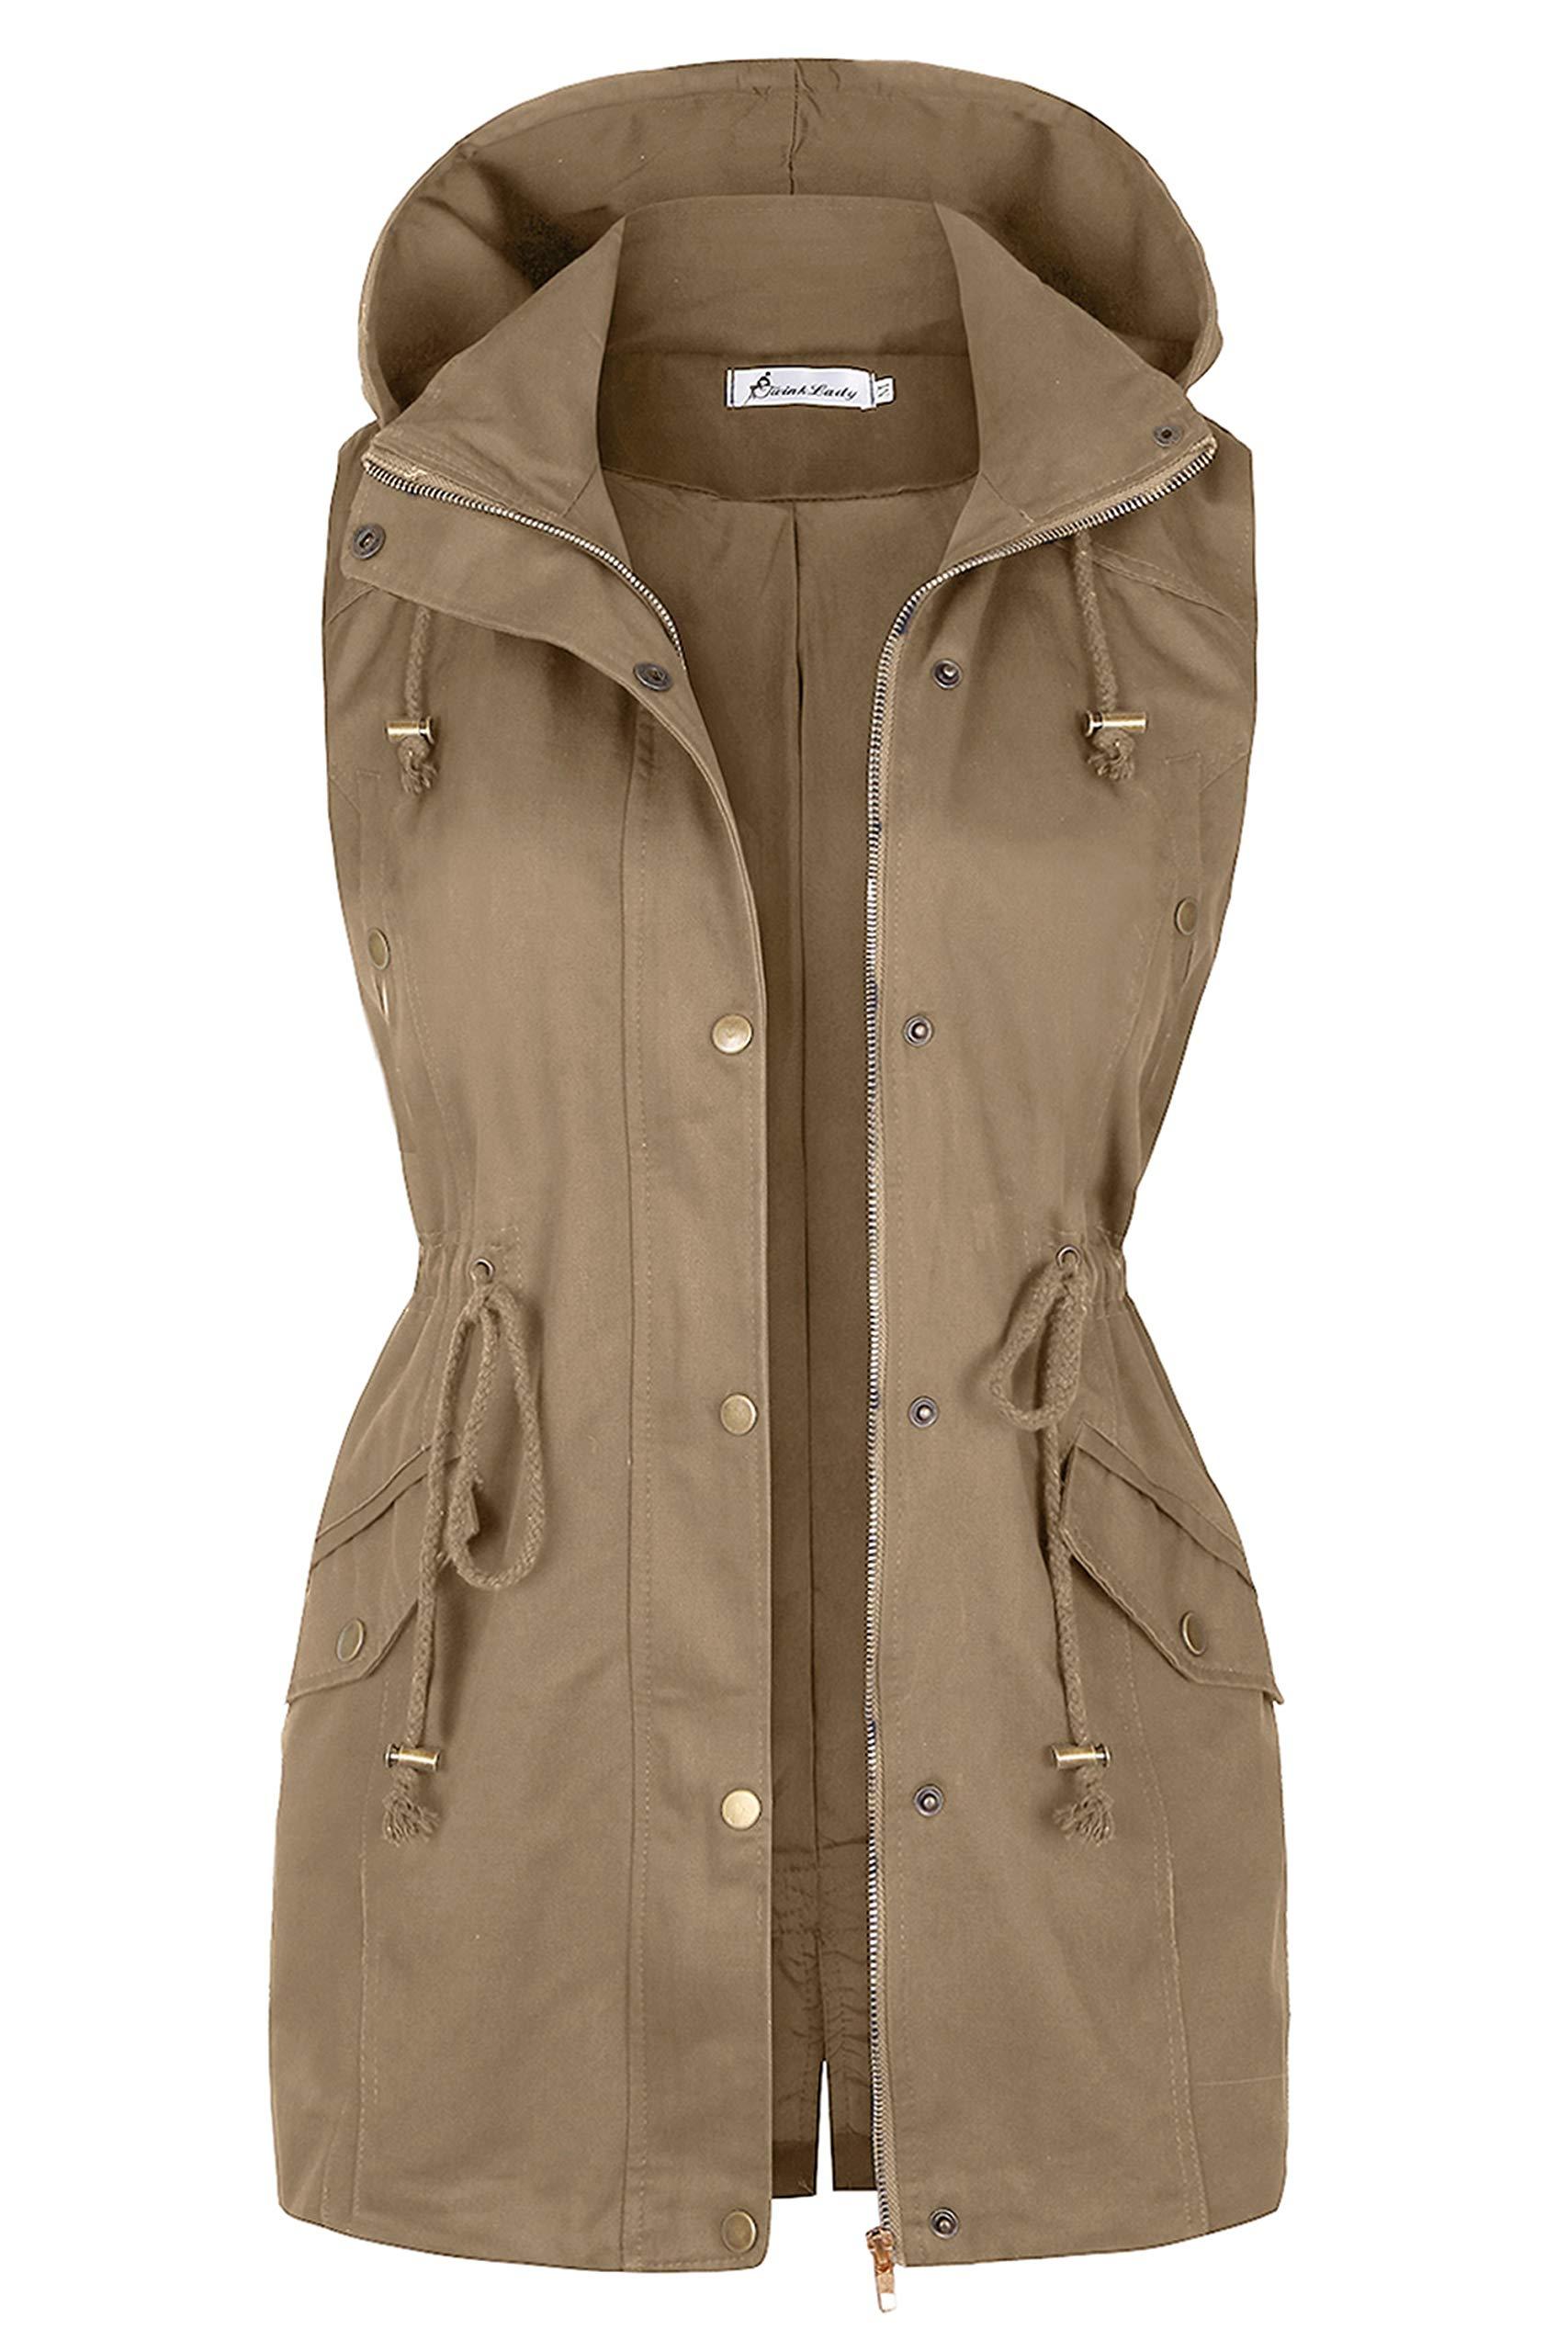 Twinklady Women's Sleeveless Lightweight Zip Up Military Safari Hood Anorak Jacket Vest A M Apricot by Twinklady